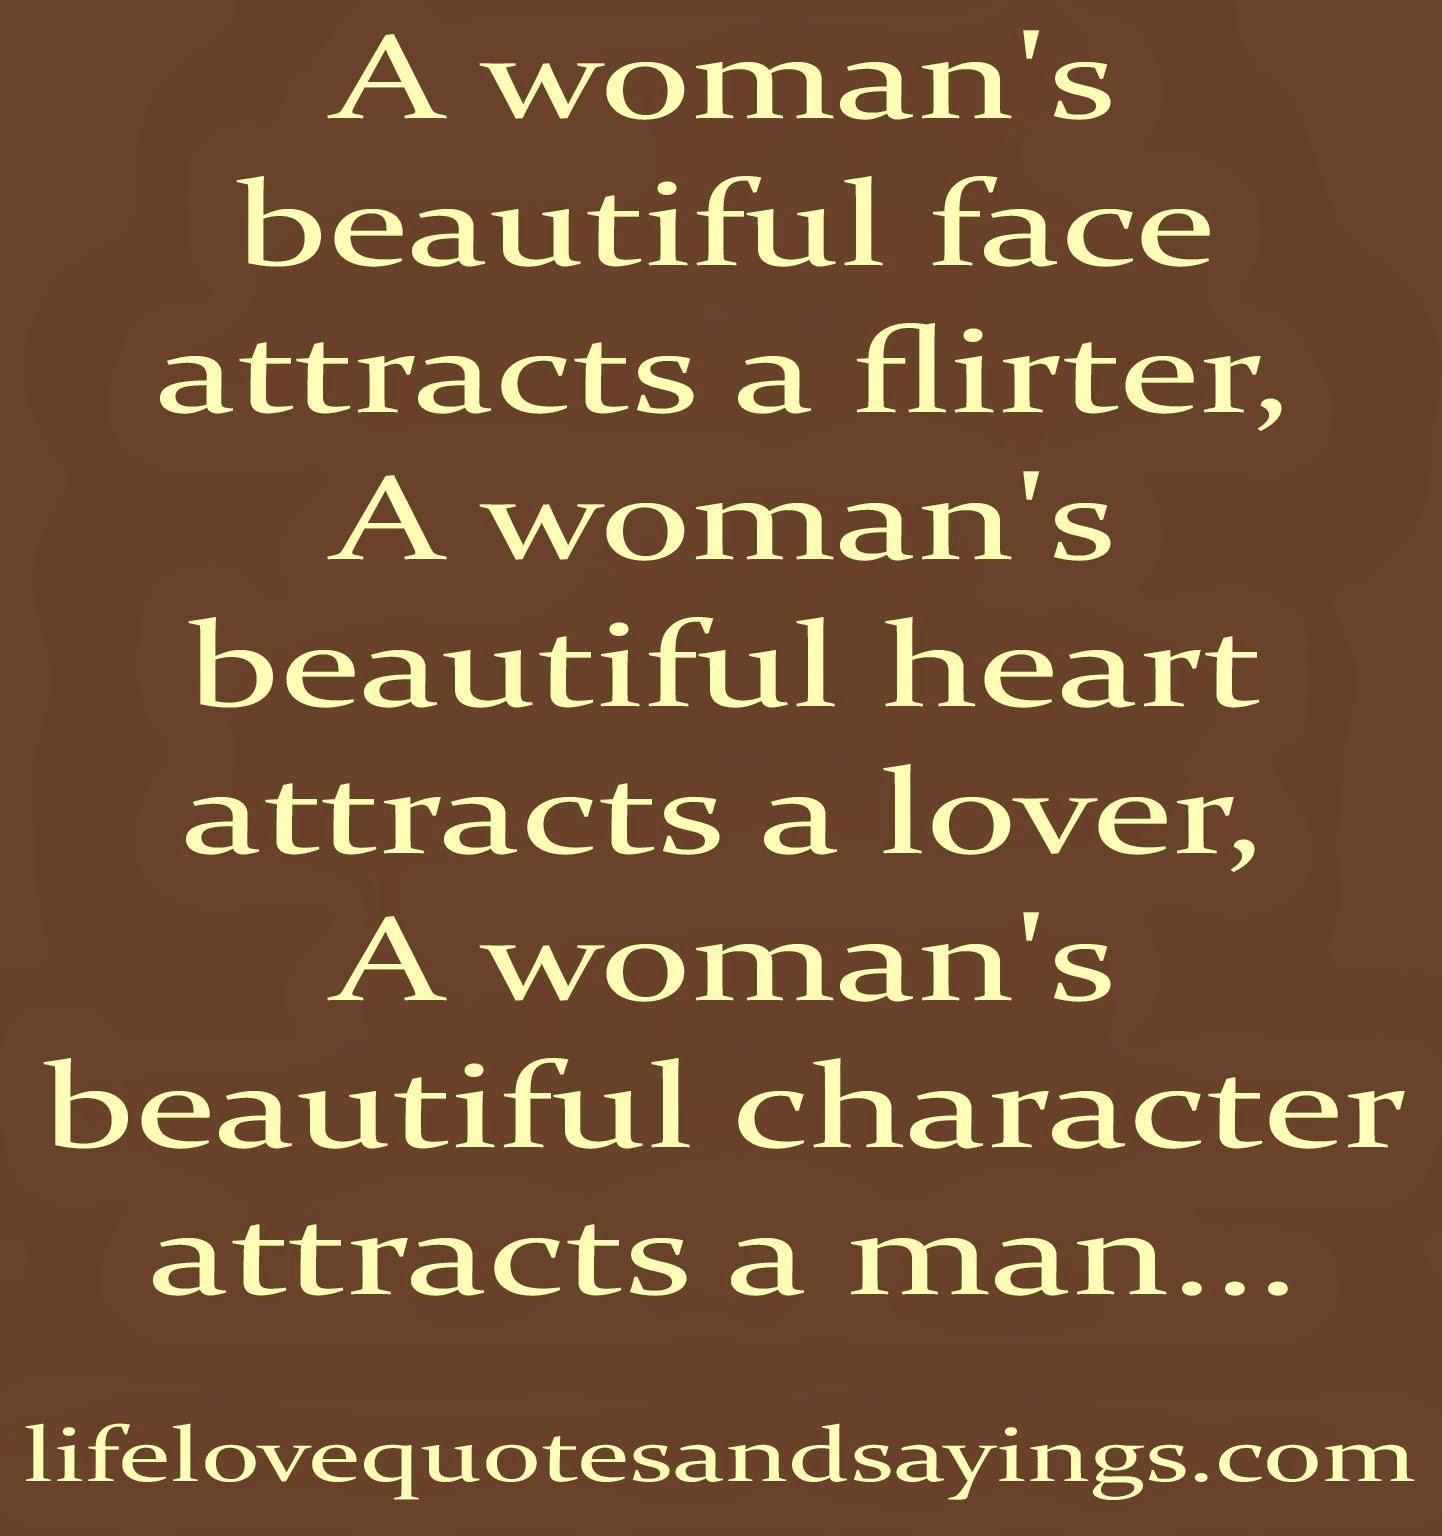 a woman's beautiful face attracts a flirter, a woman's beautiful heart attracts a lover, a woman's beautiful character attracts a man…